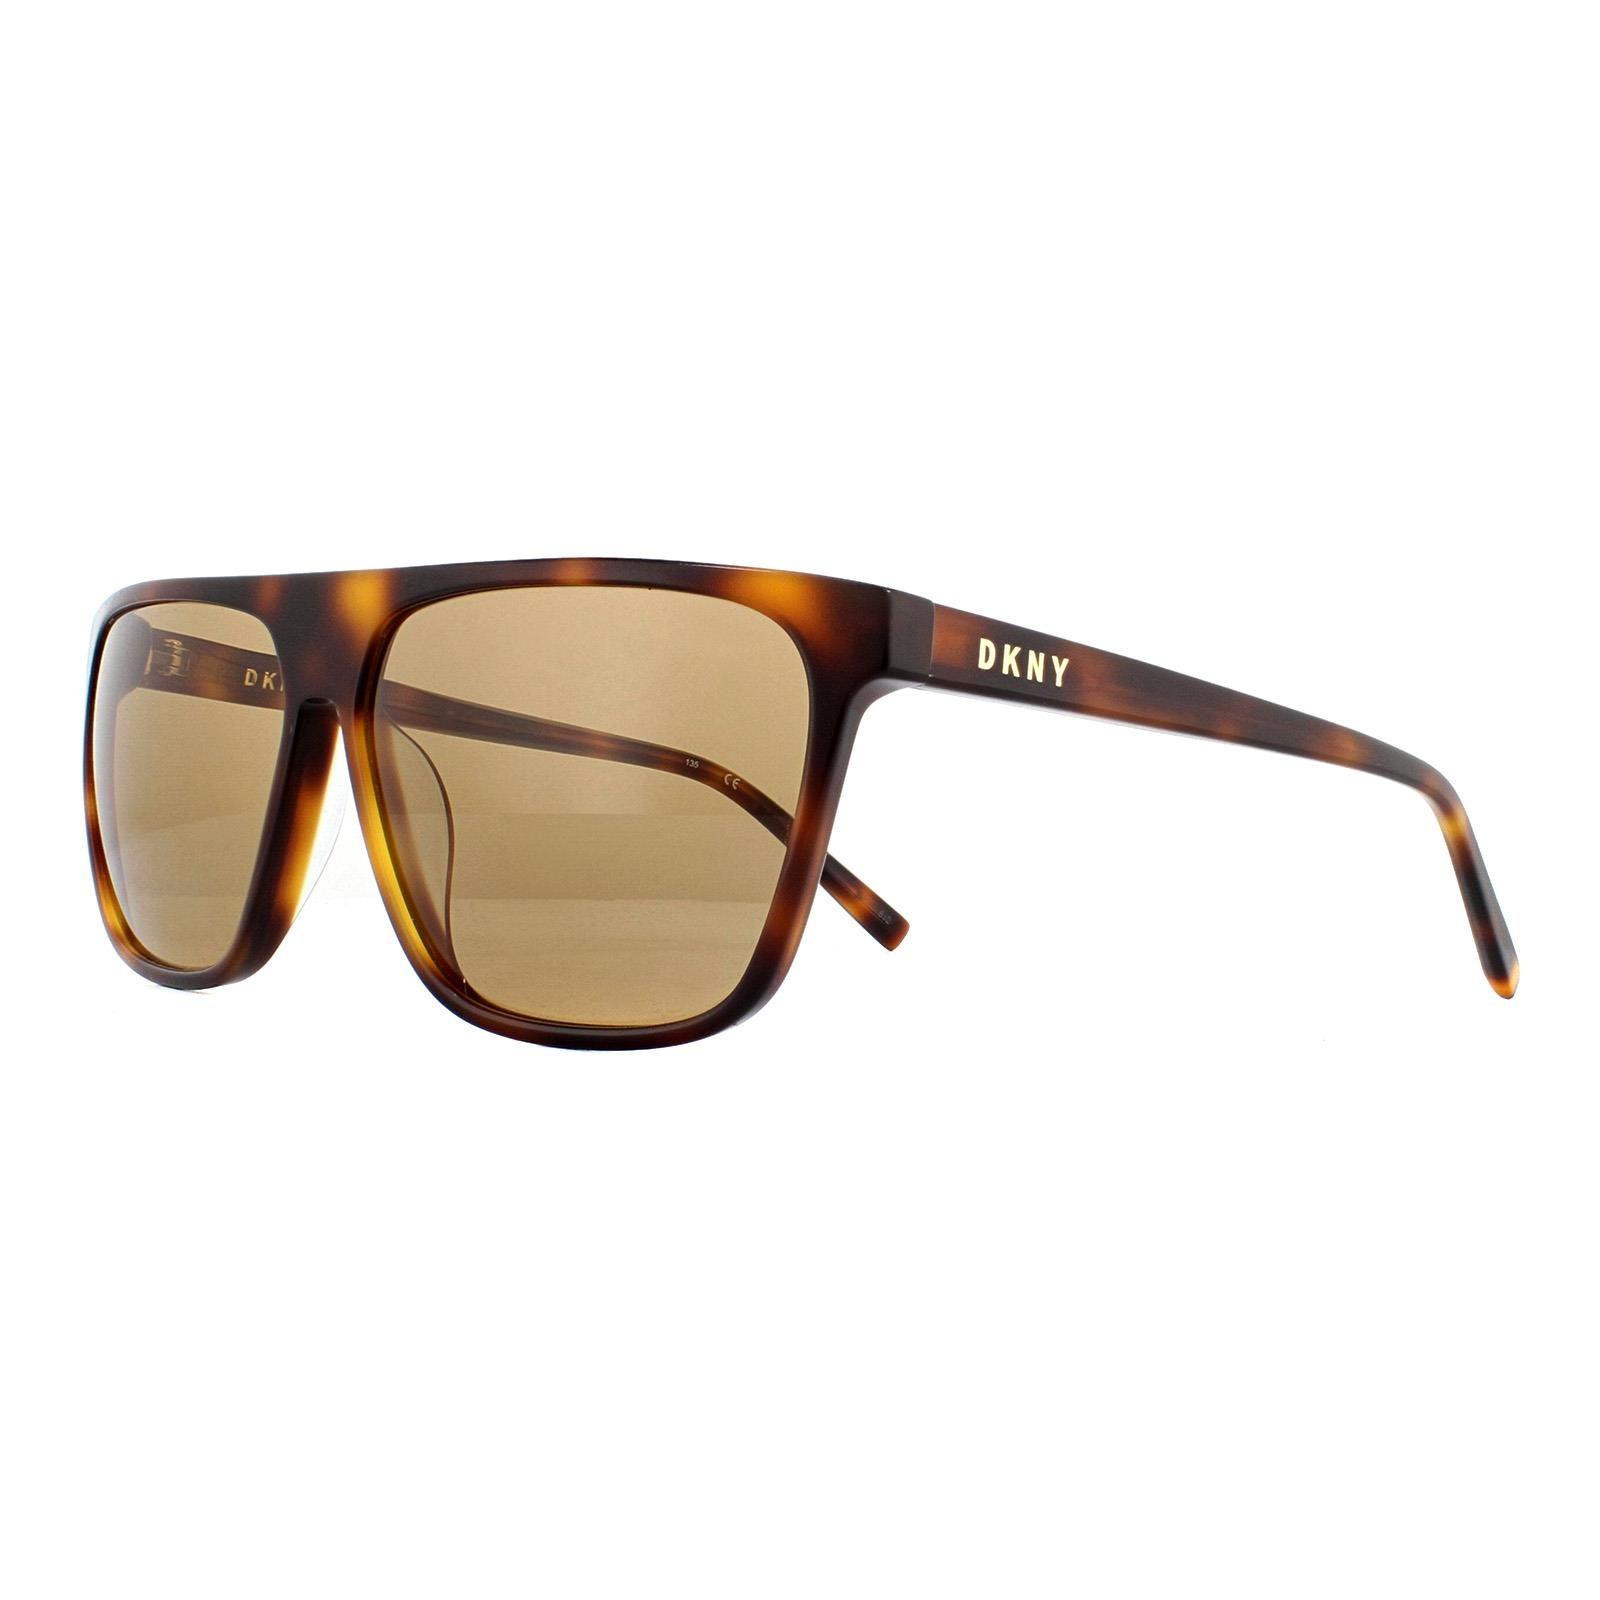 DKNY Sunglasses DK503S 240 Soft Tortoise Brown